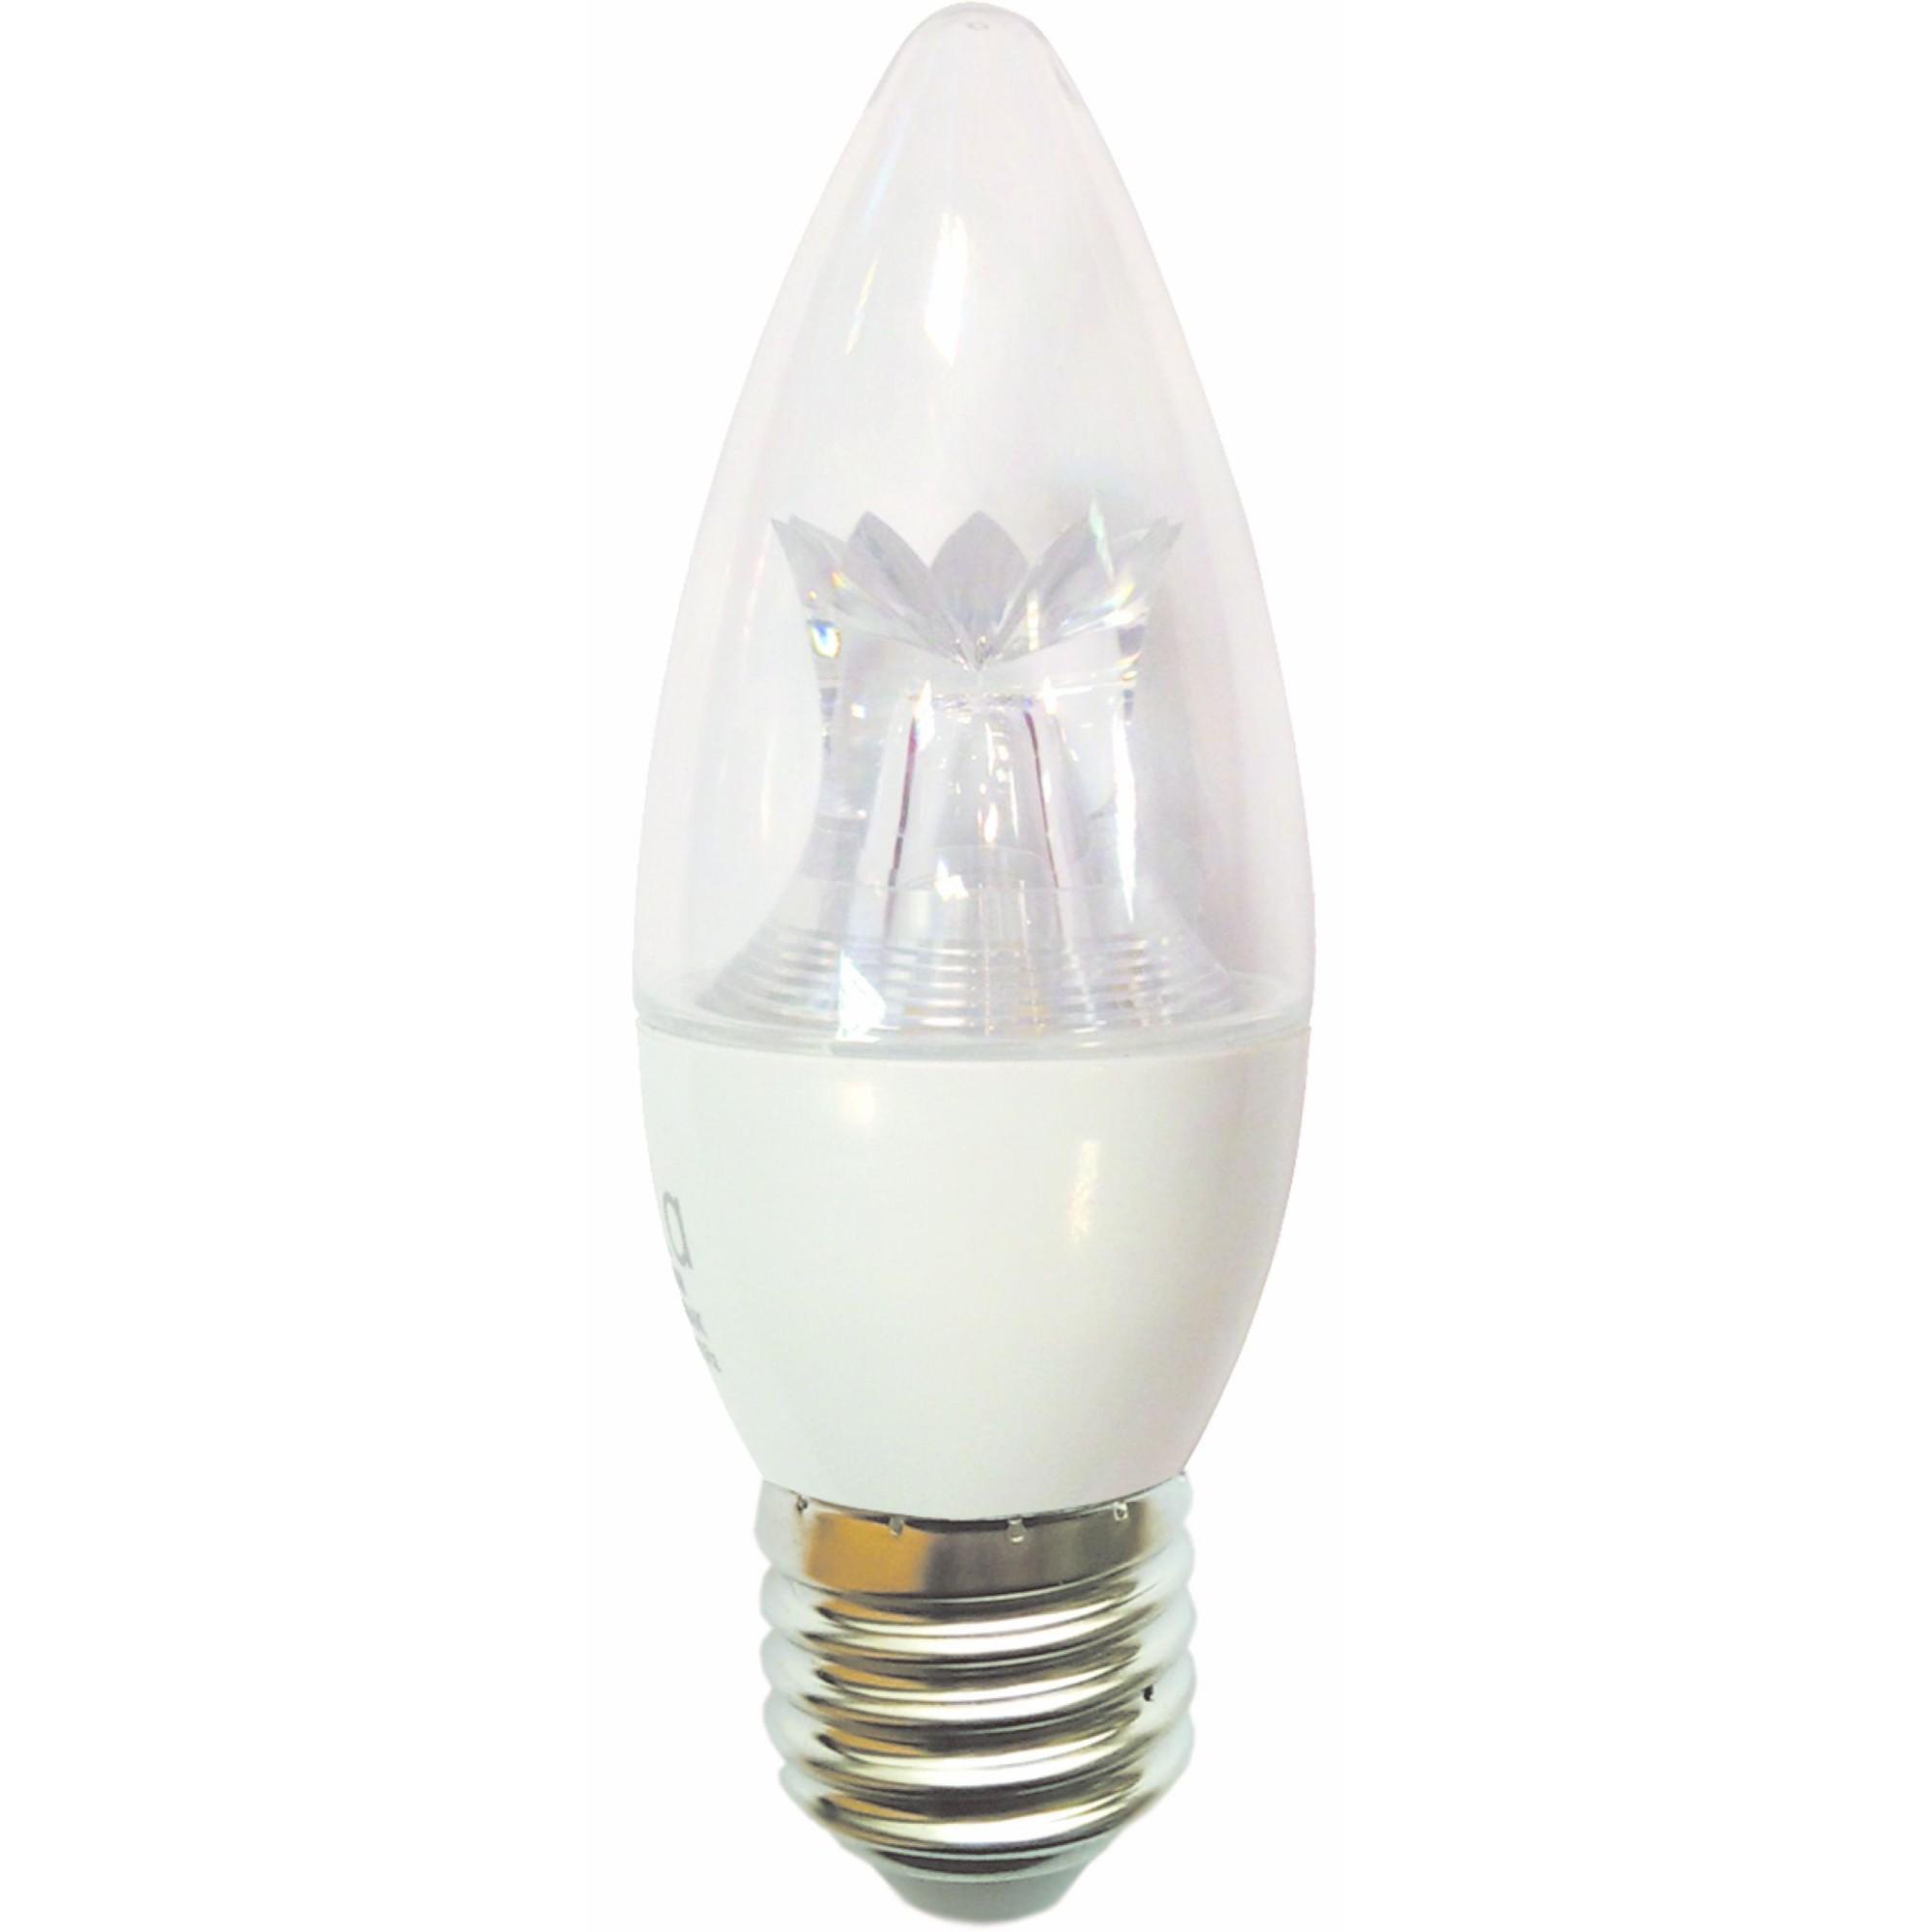 Лампа Ecola Premium светодионая E27 8 Вт свеча 720 Лм теплый свет